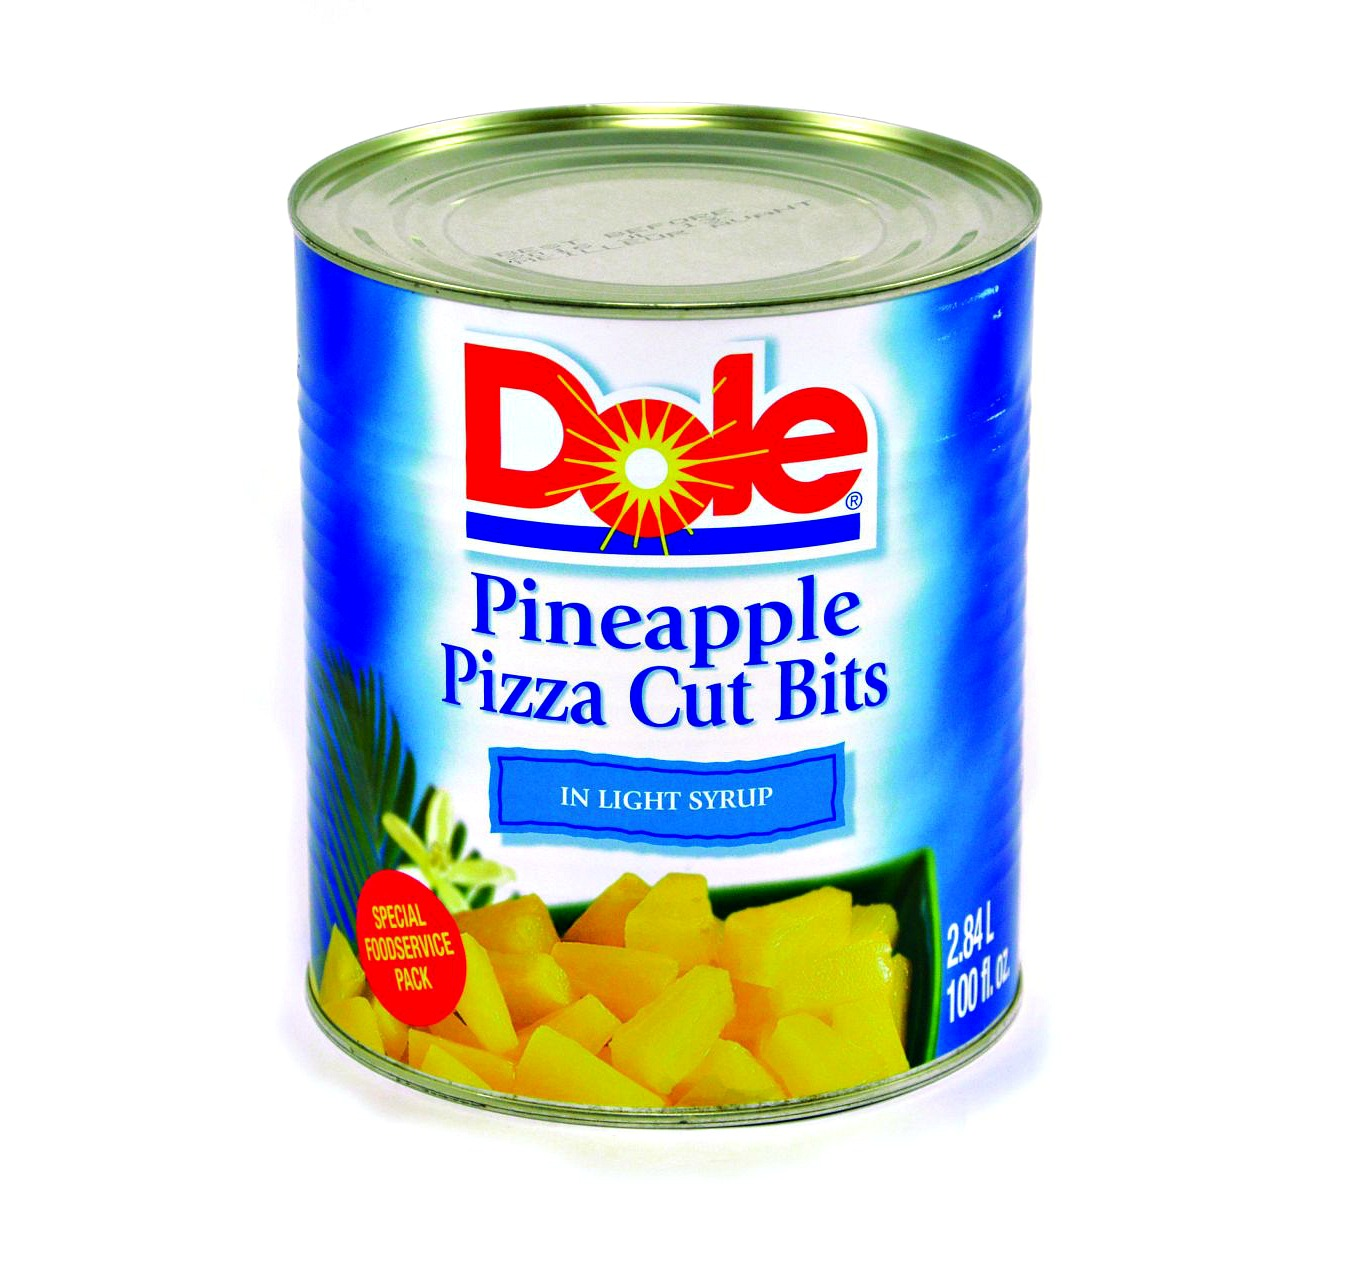 Dole Pineapple Pizza Cut Bits 100 oz